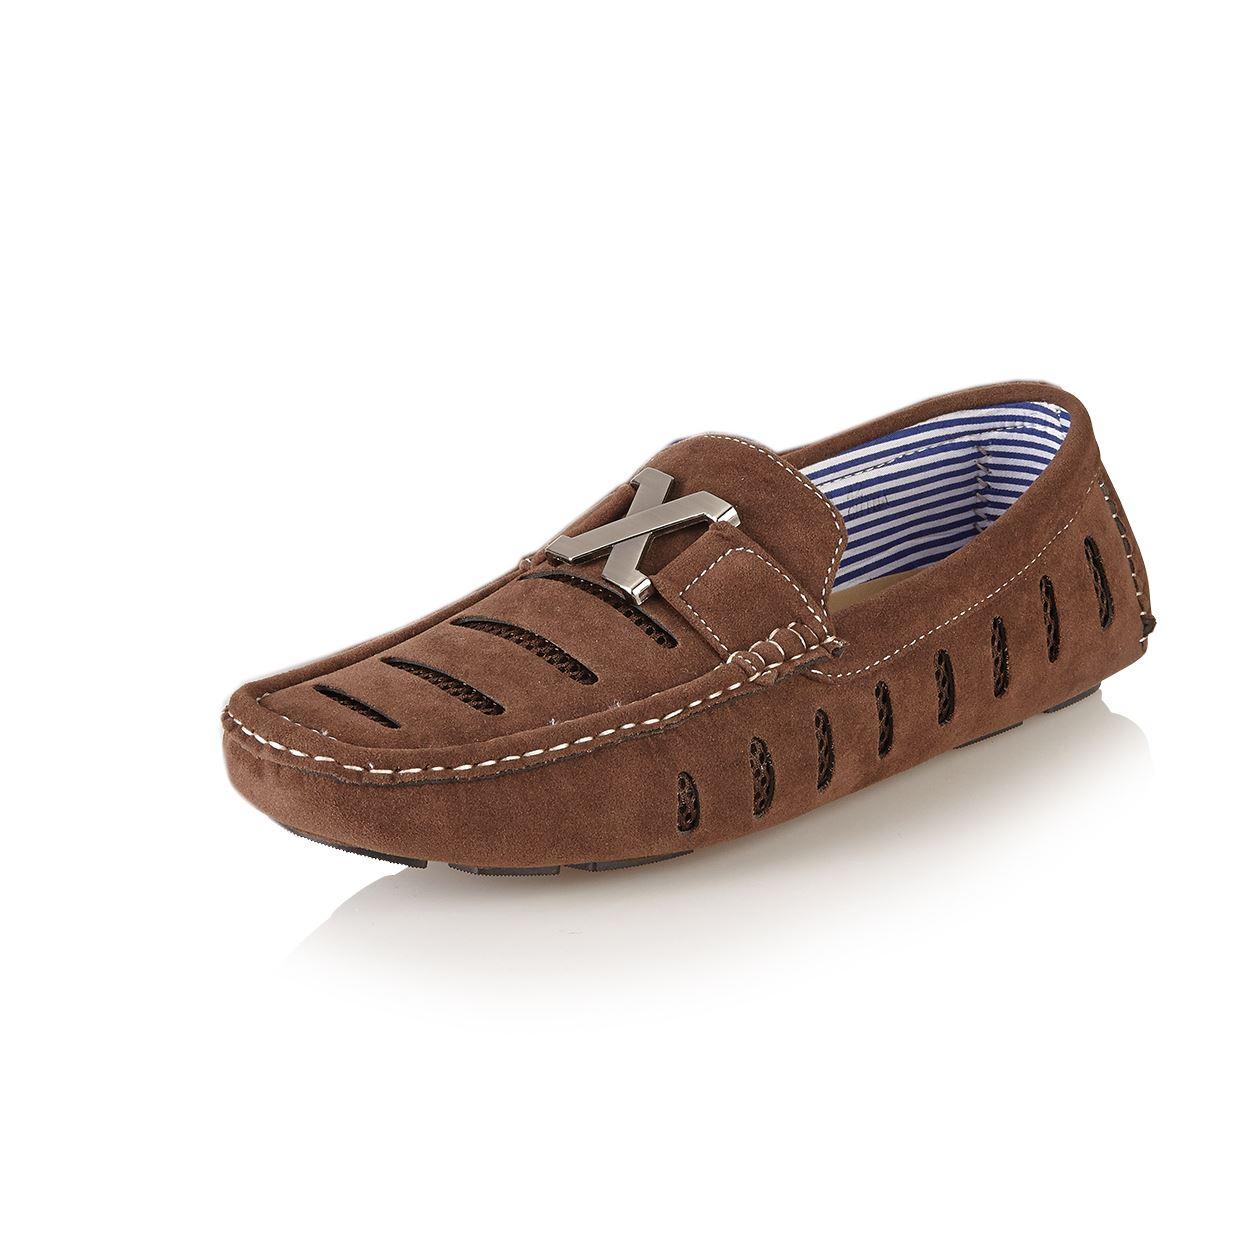 new mens casual designer inspired loafers moccasins slip